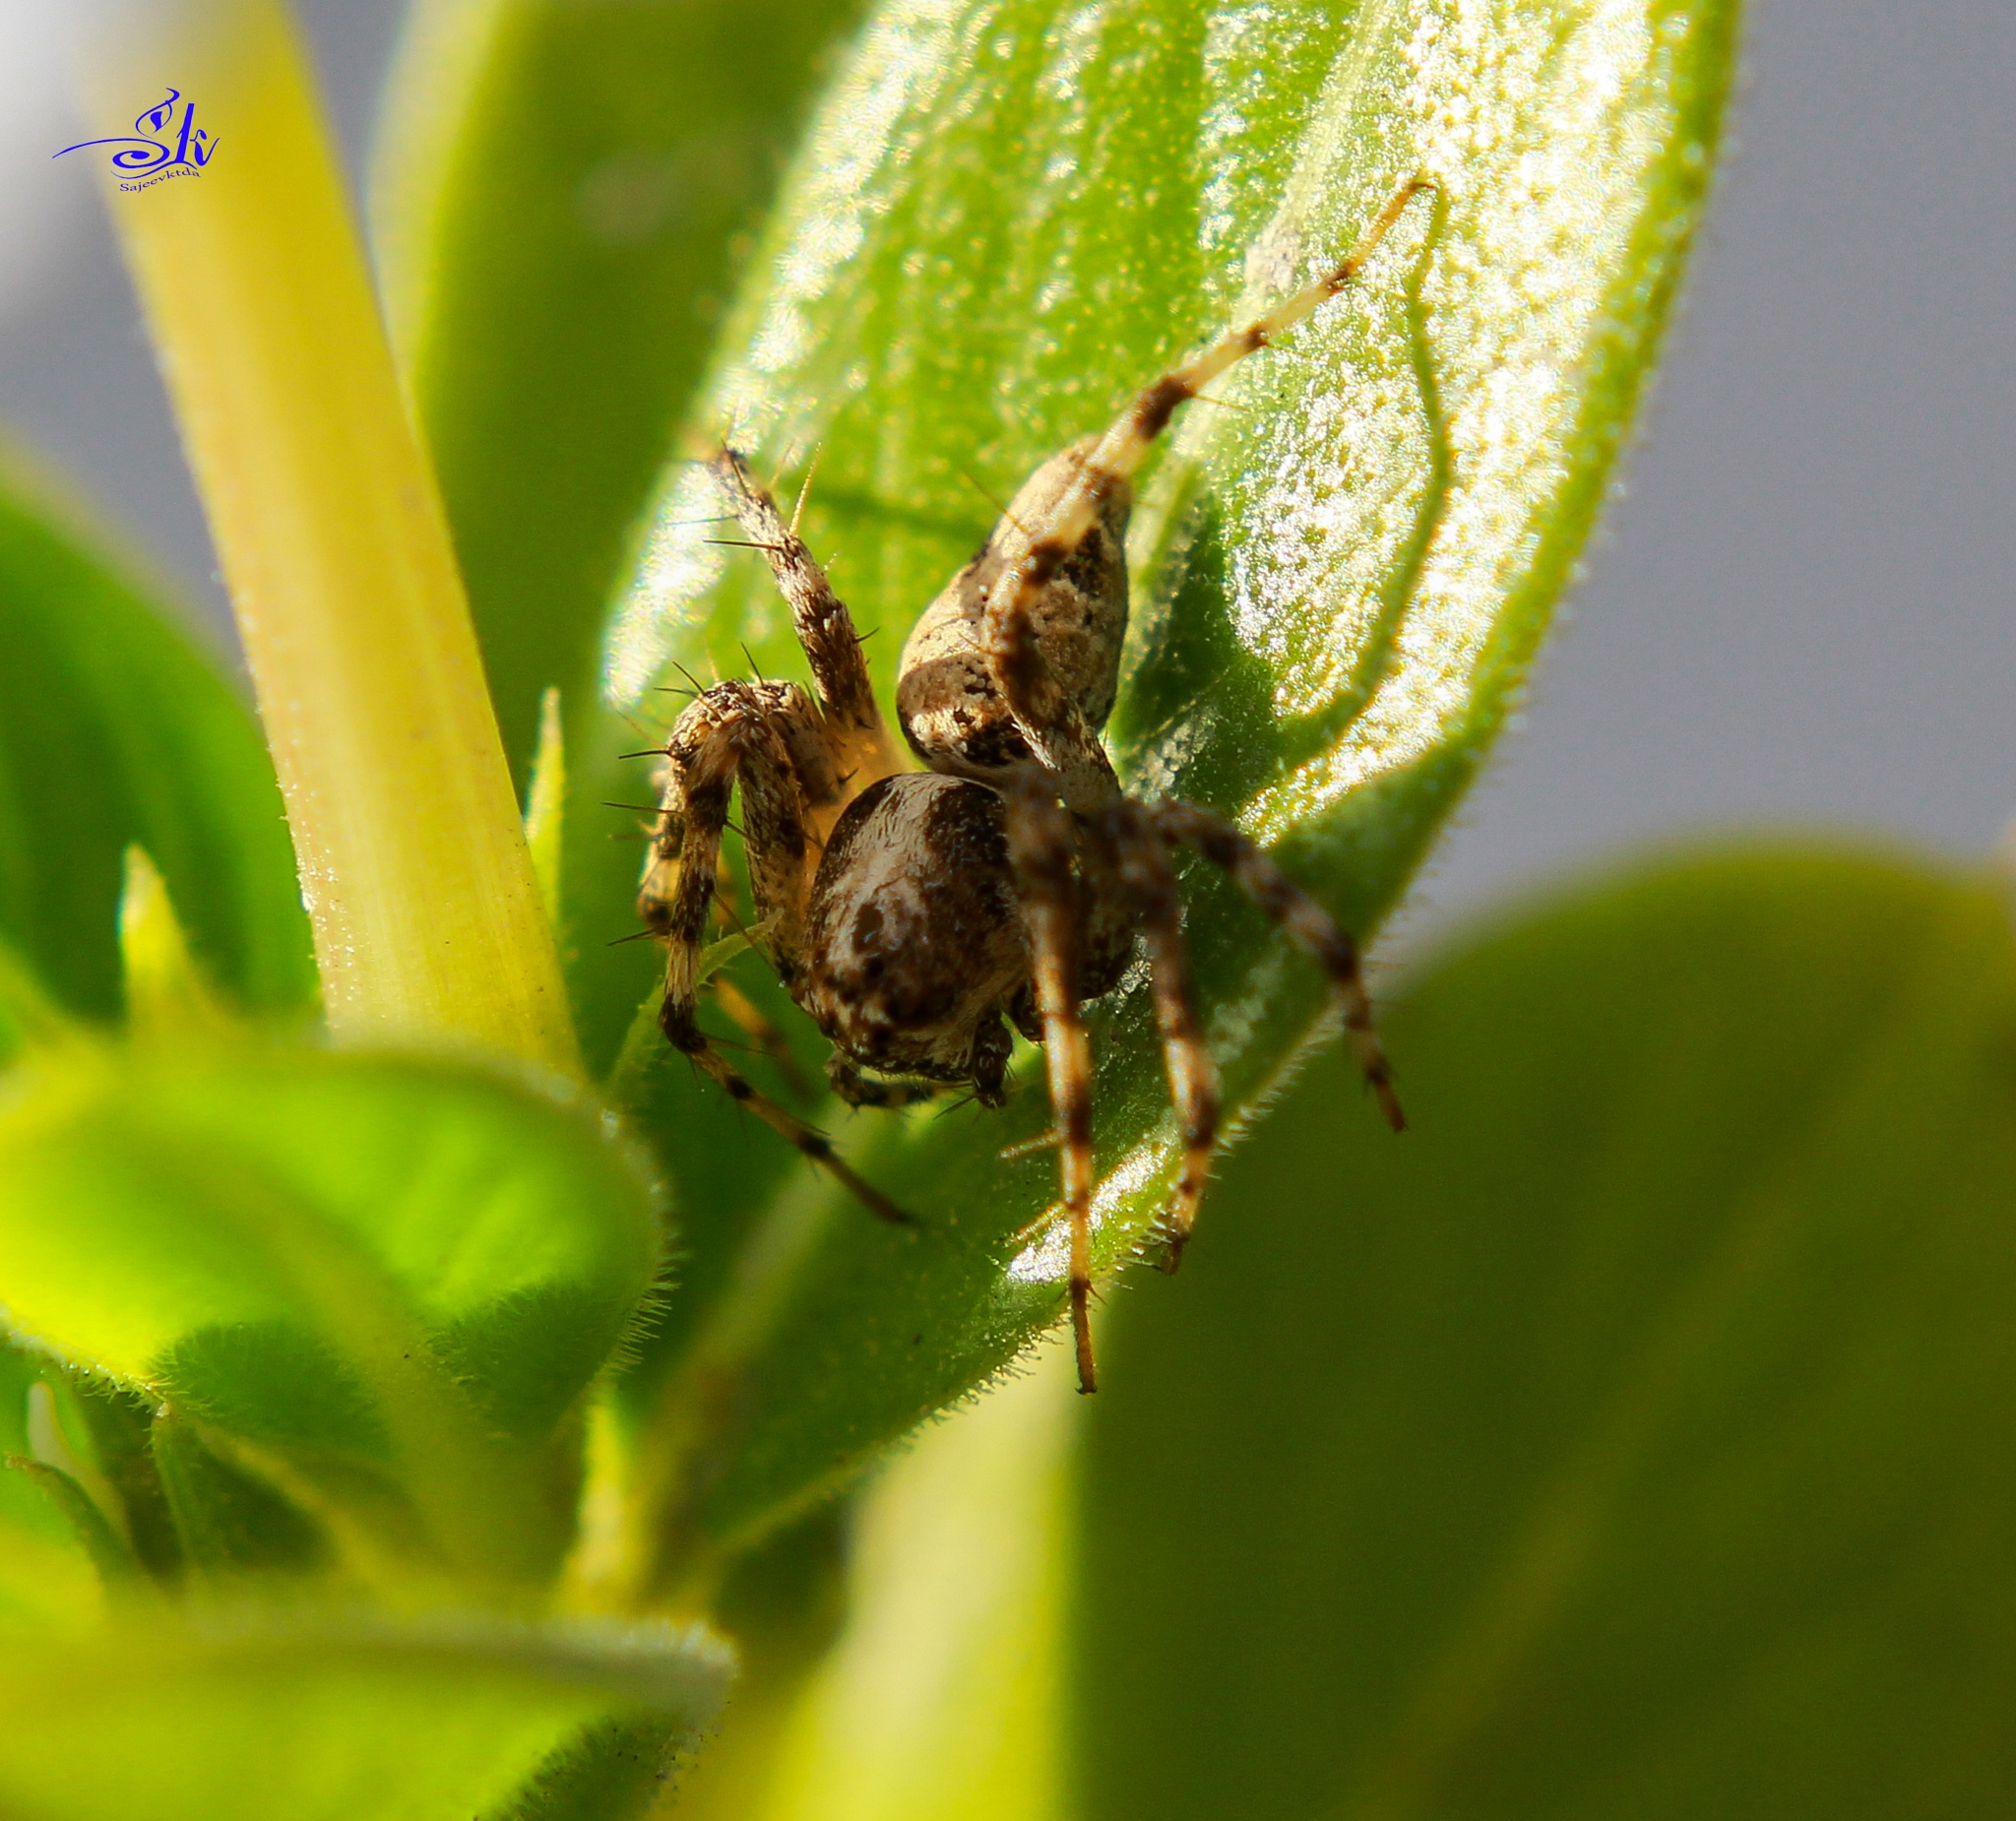 spider by Sajeev Kumar